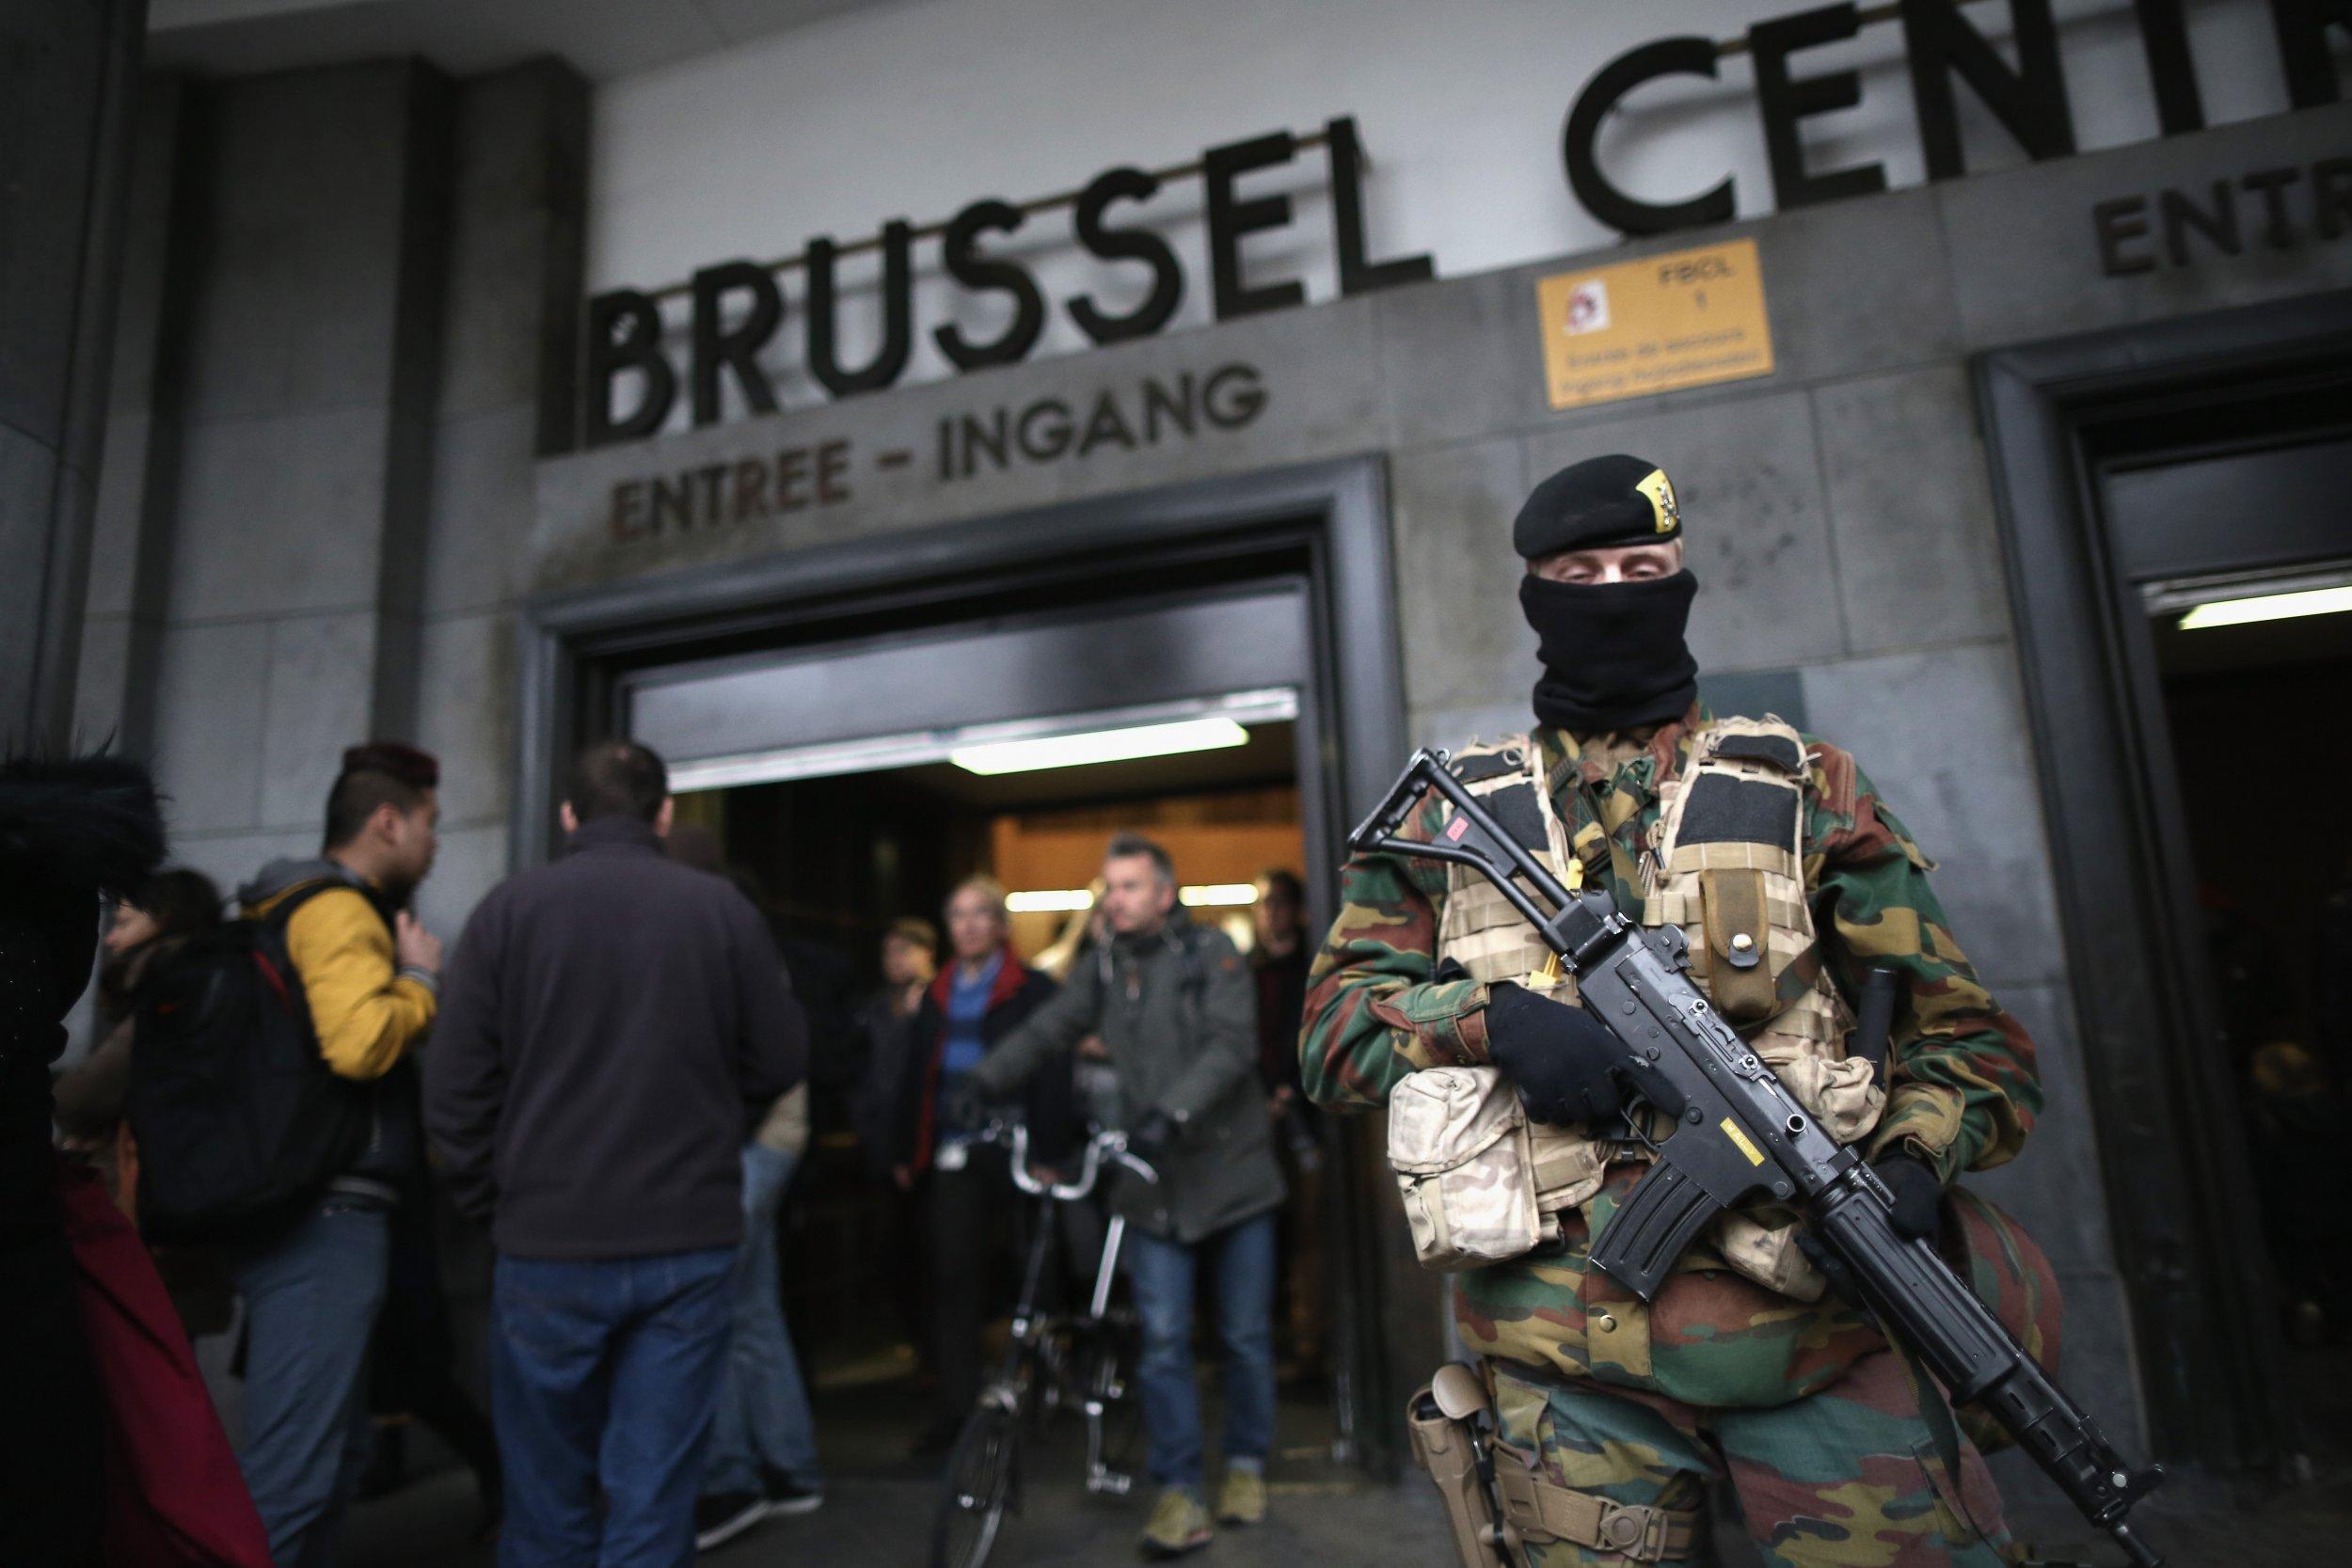 Brussels Belgium Europe Middle East